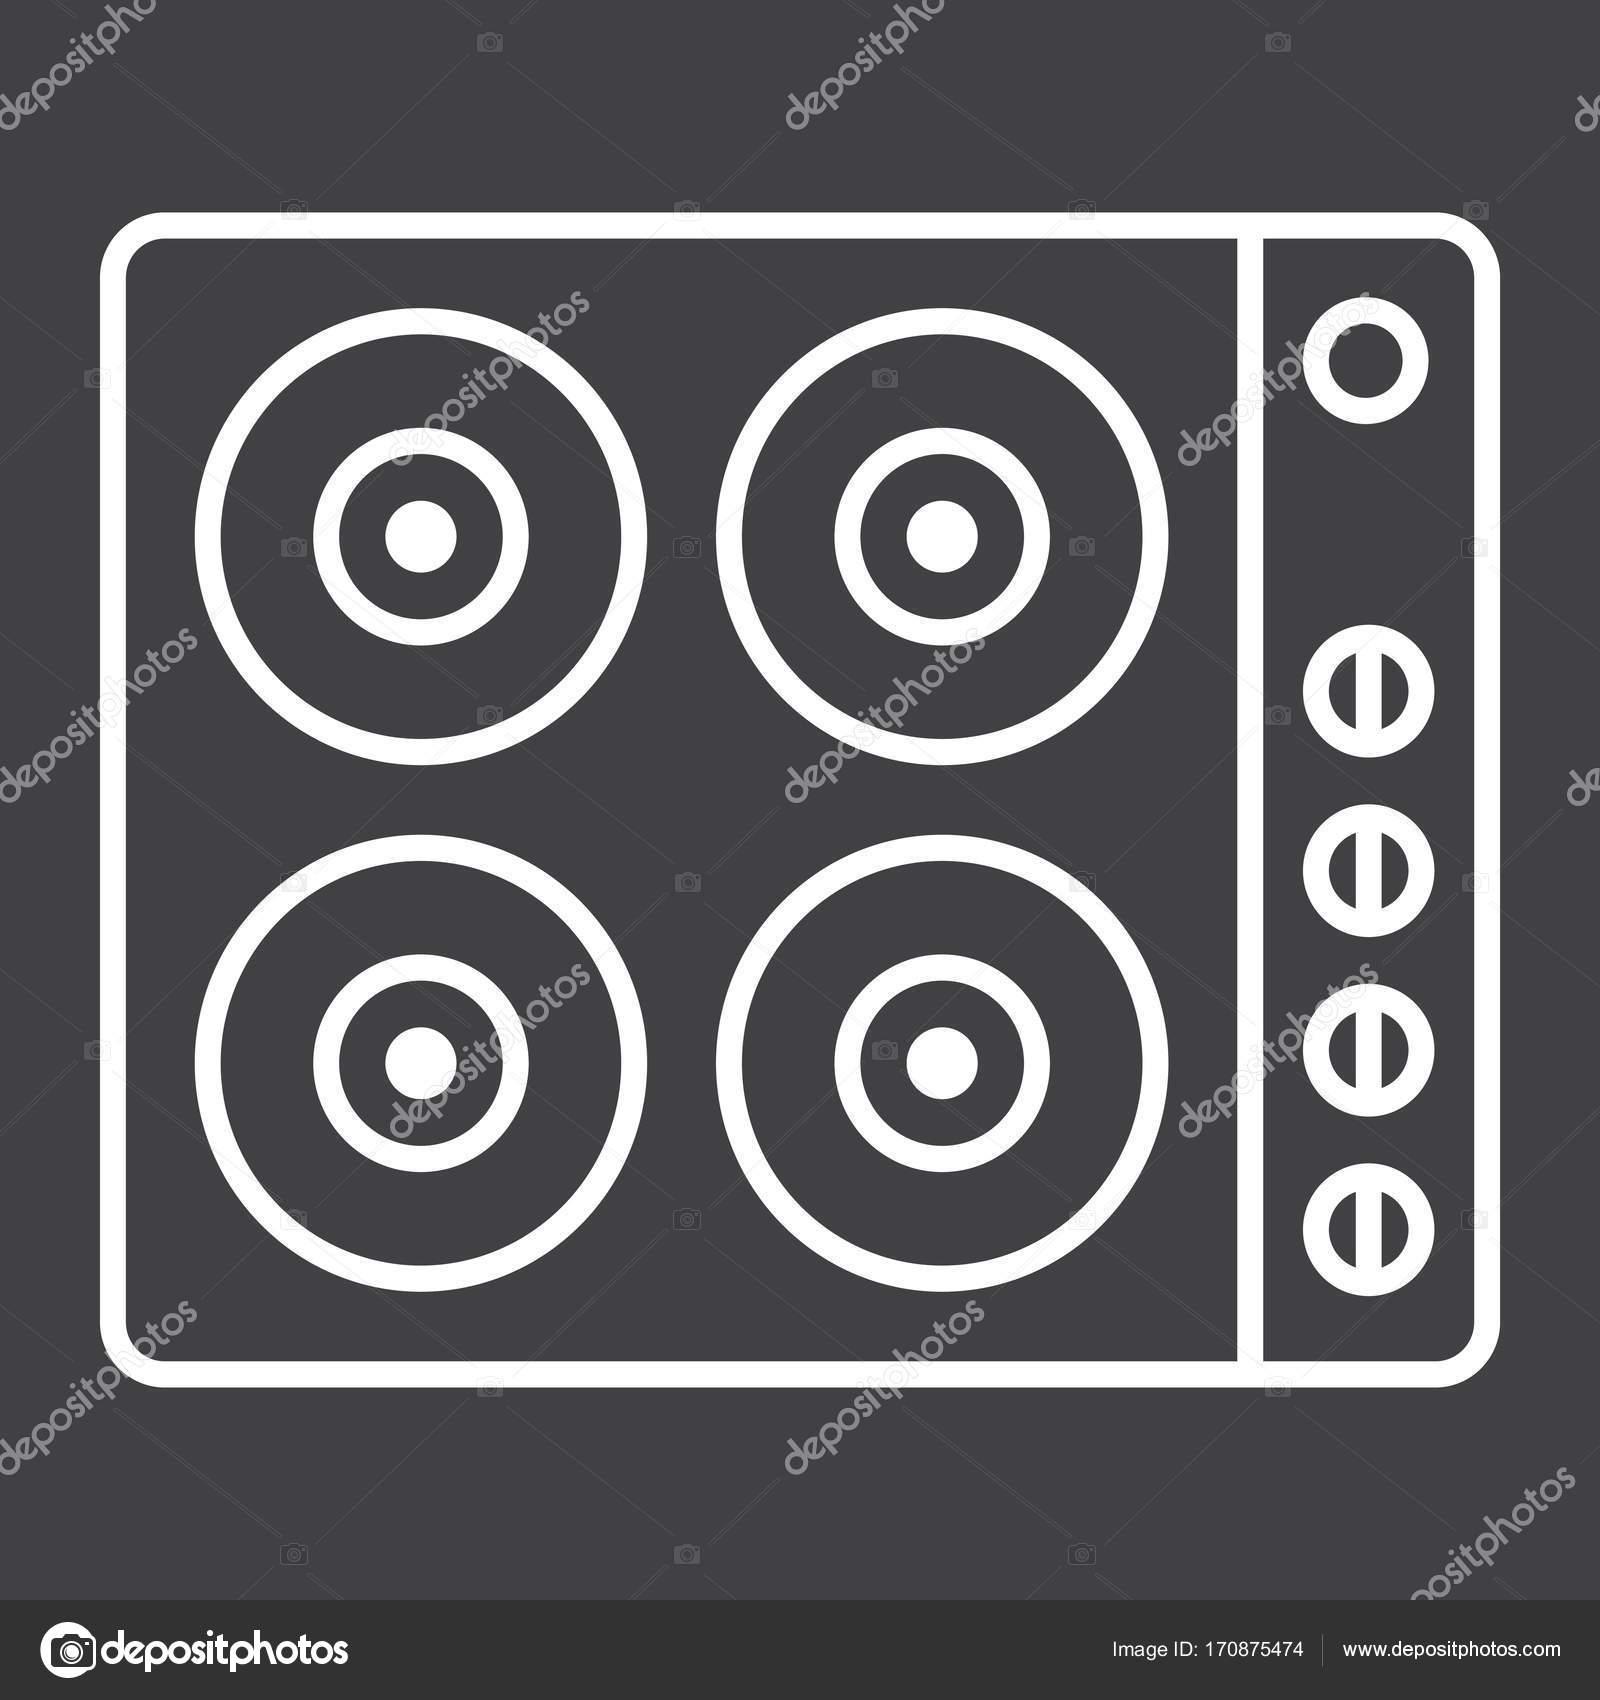 elektrische Kochplatte Liniensymbol, elektrischer Herd — Stockvektor ...